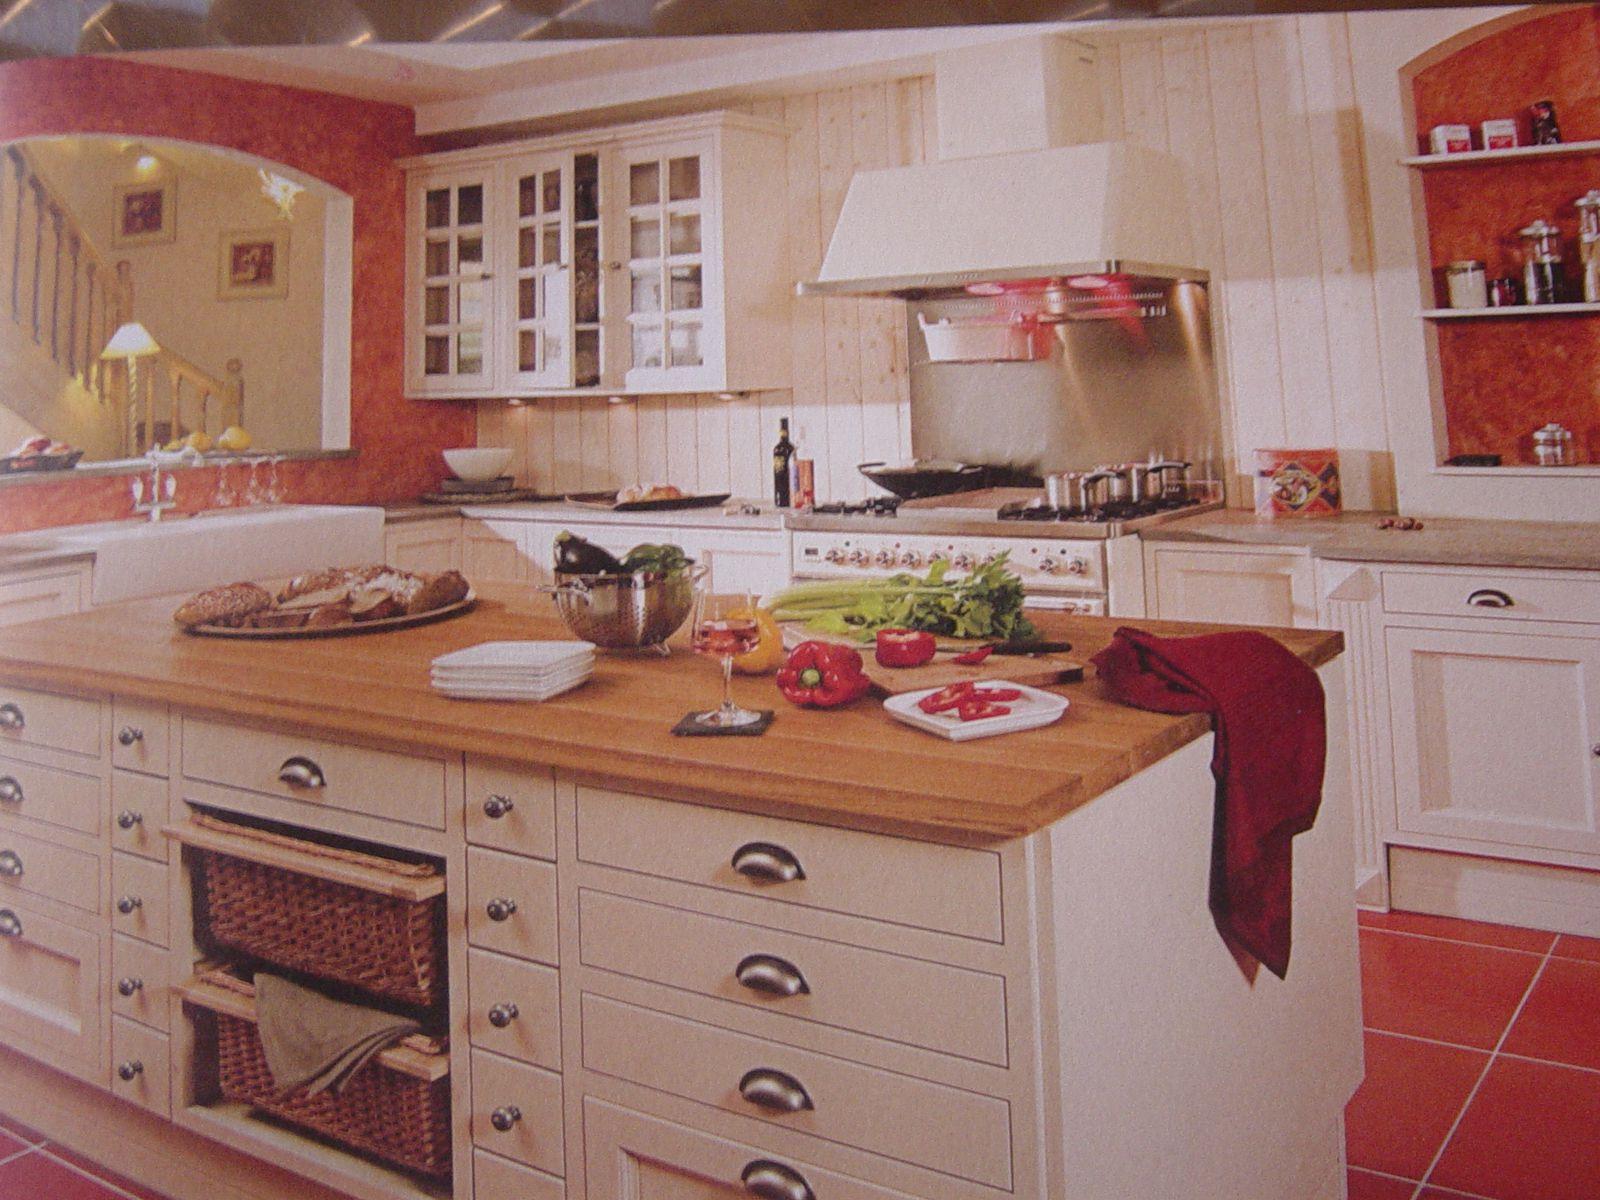 cuisine traditionnelle porte a cadre affleurant cuisines. Black Bedroom Furniture Sets. Home Design Ideas